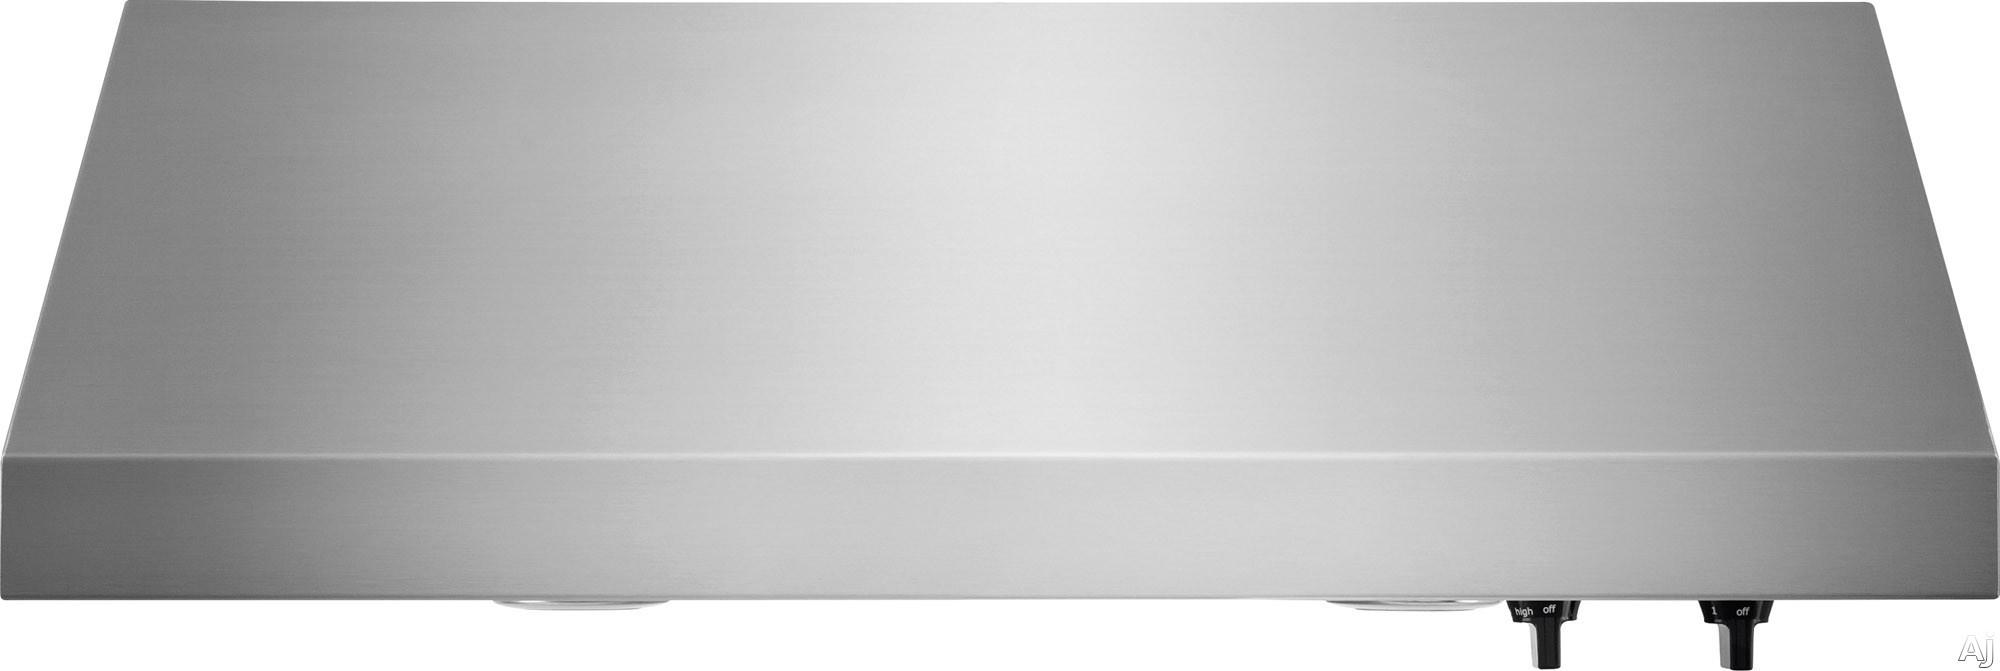 Centrifugal Fan Icon : Electrolux halogen usa